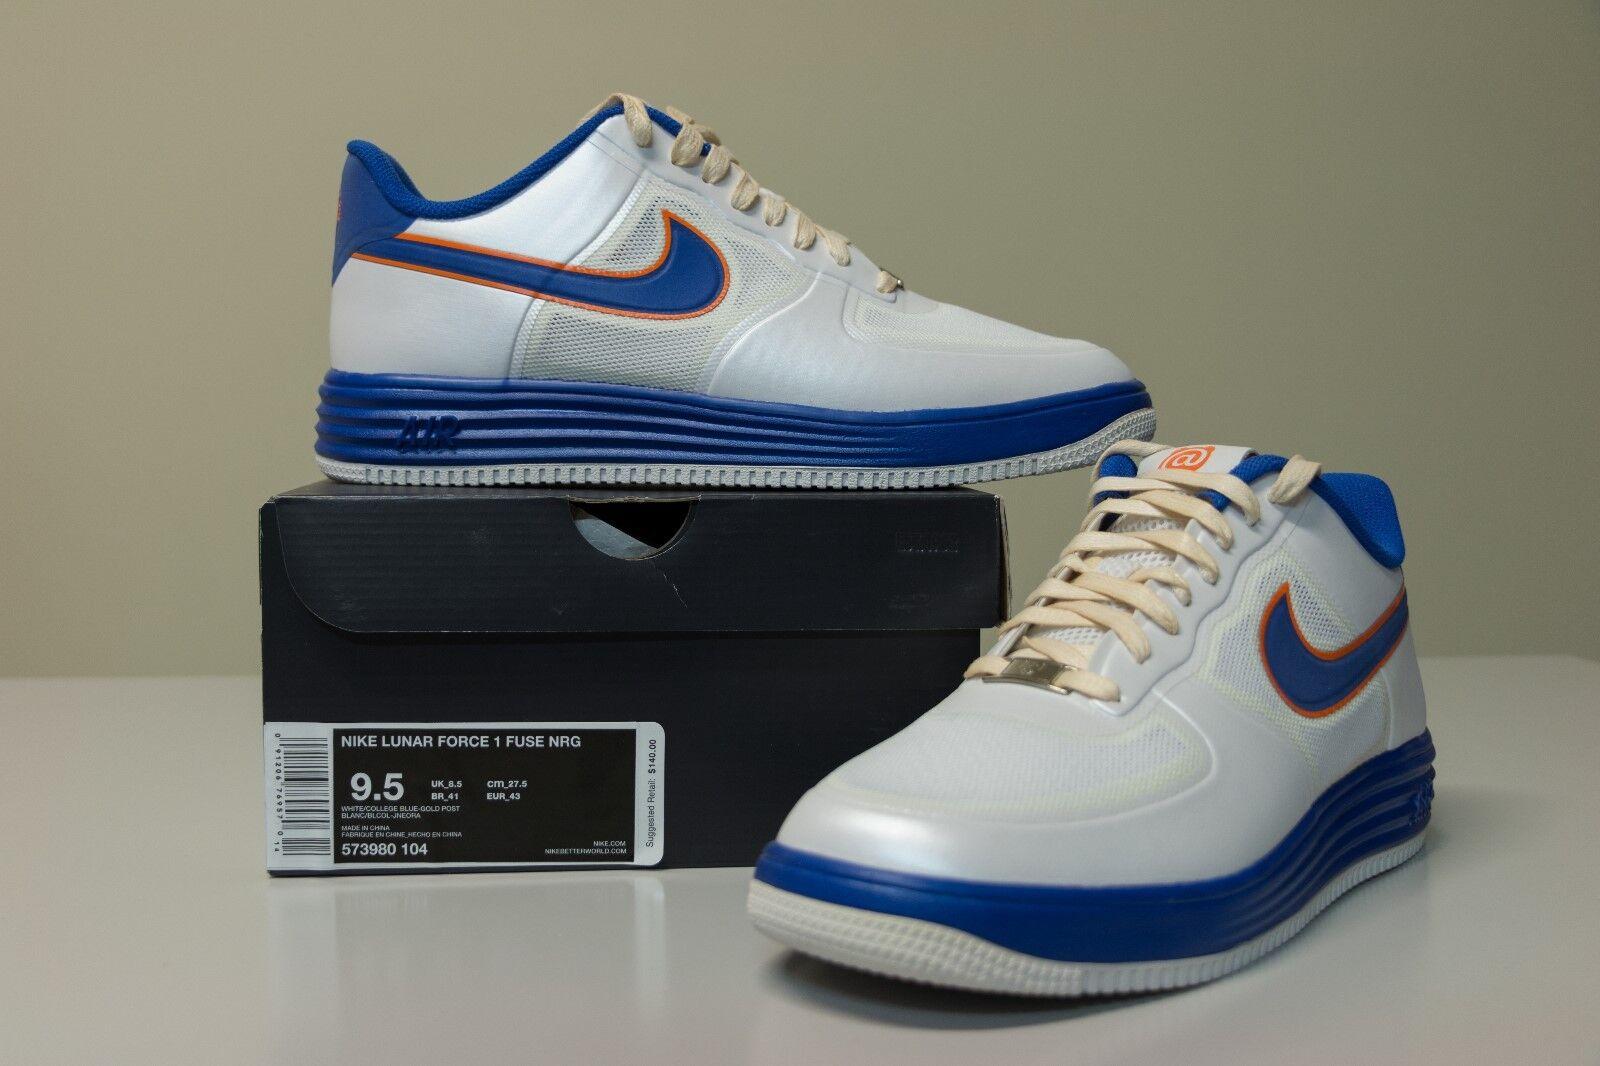 Nike Lunar Force 1 Fusible NRG Medicom bearbrick | comodo comodo | baratos zapatos de mujer zapatos de mujer 5cd9d9